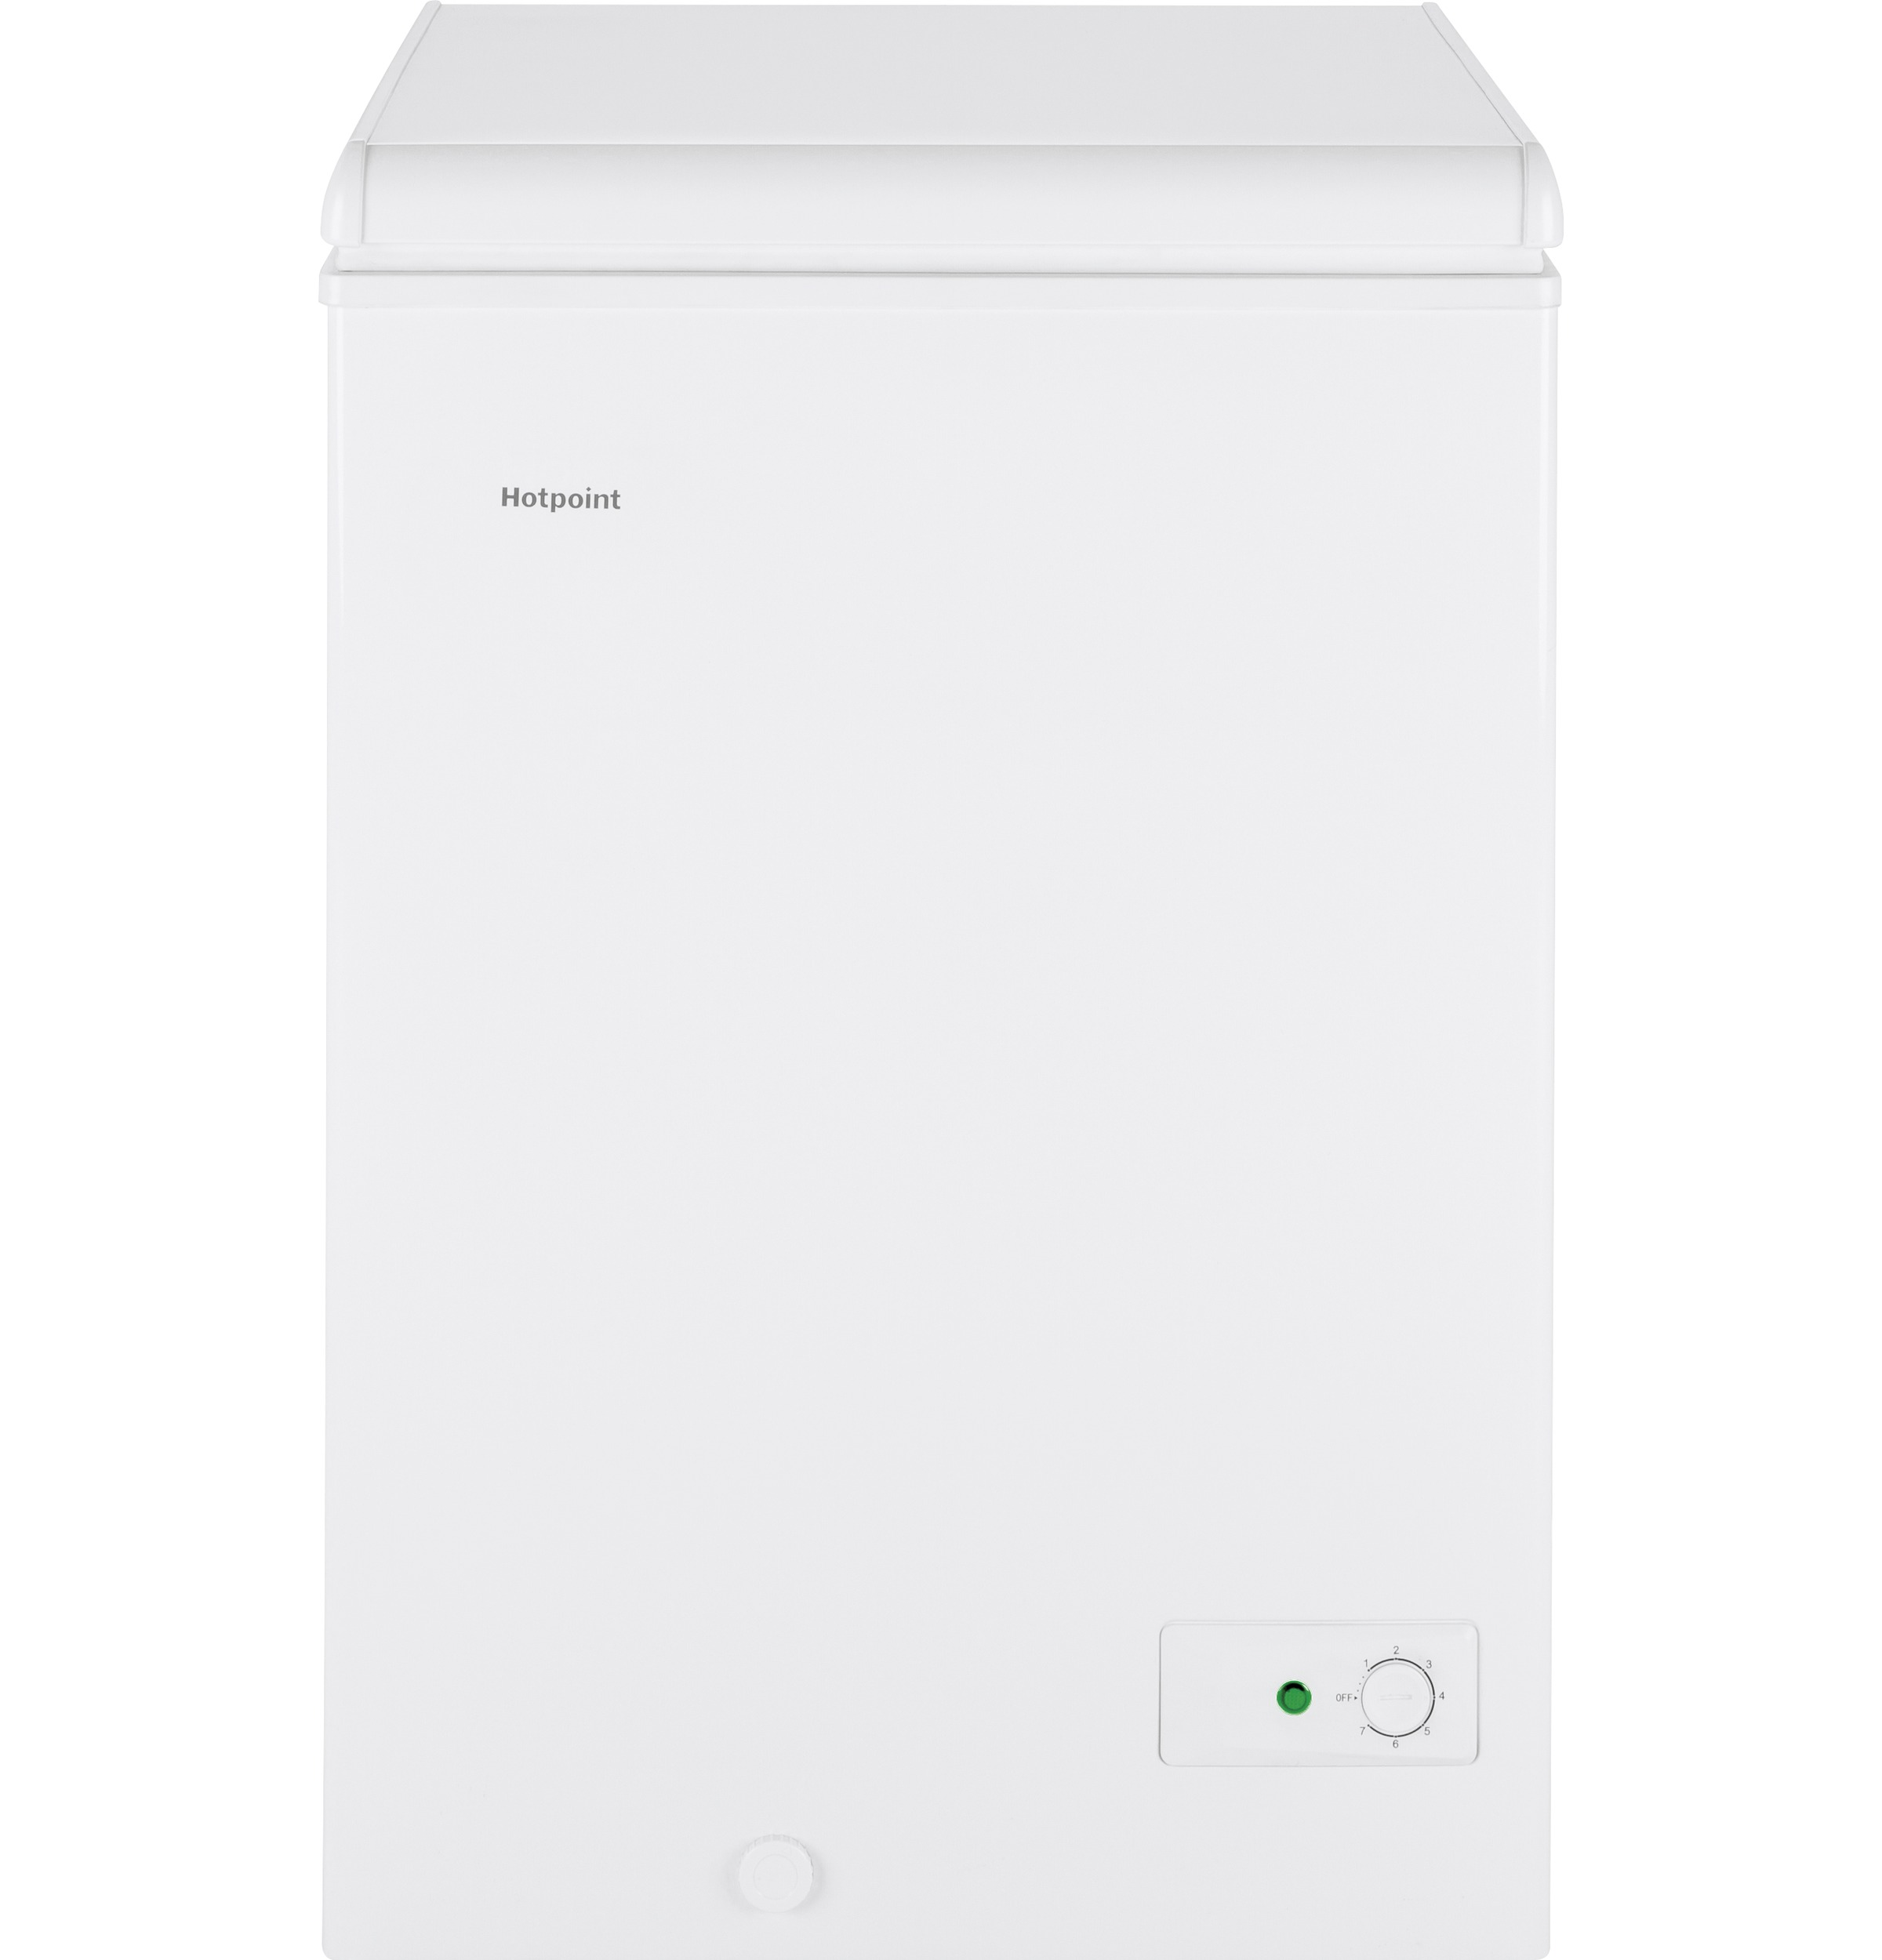 medium resolution of sears kenmore elite upright freezer manual photos and